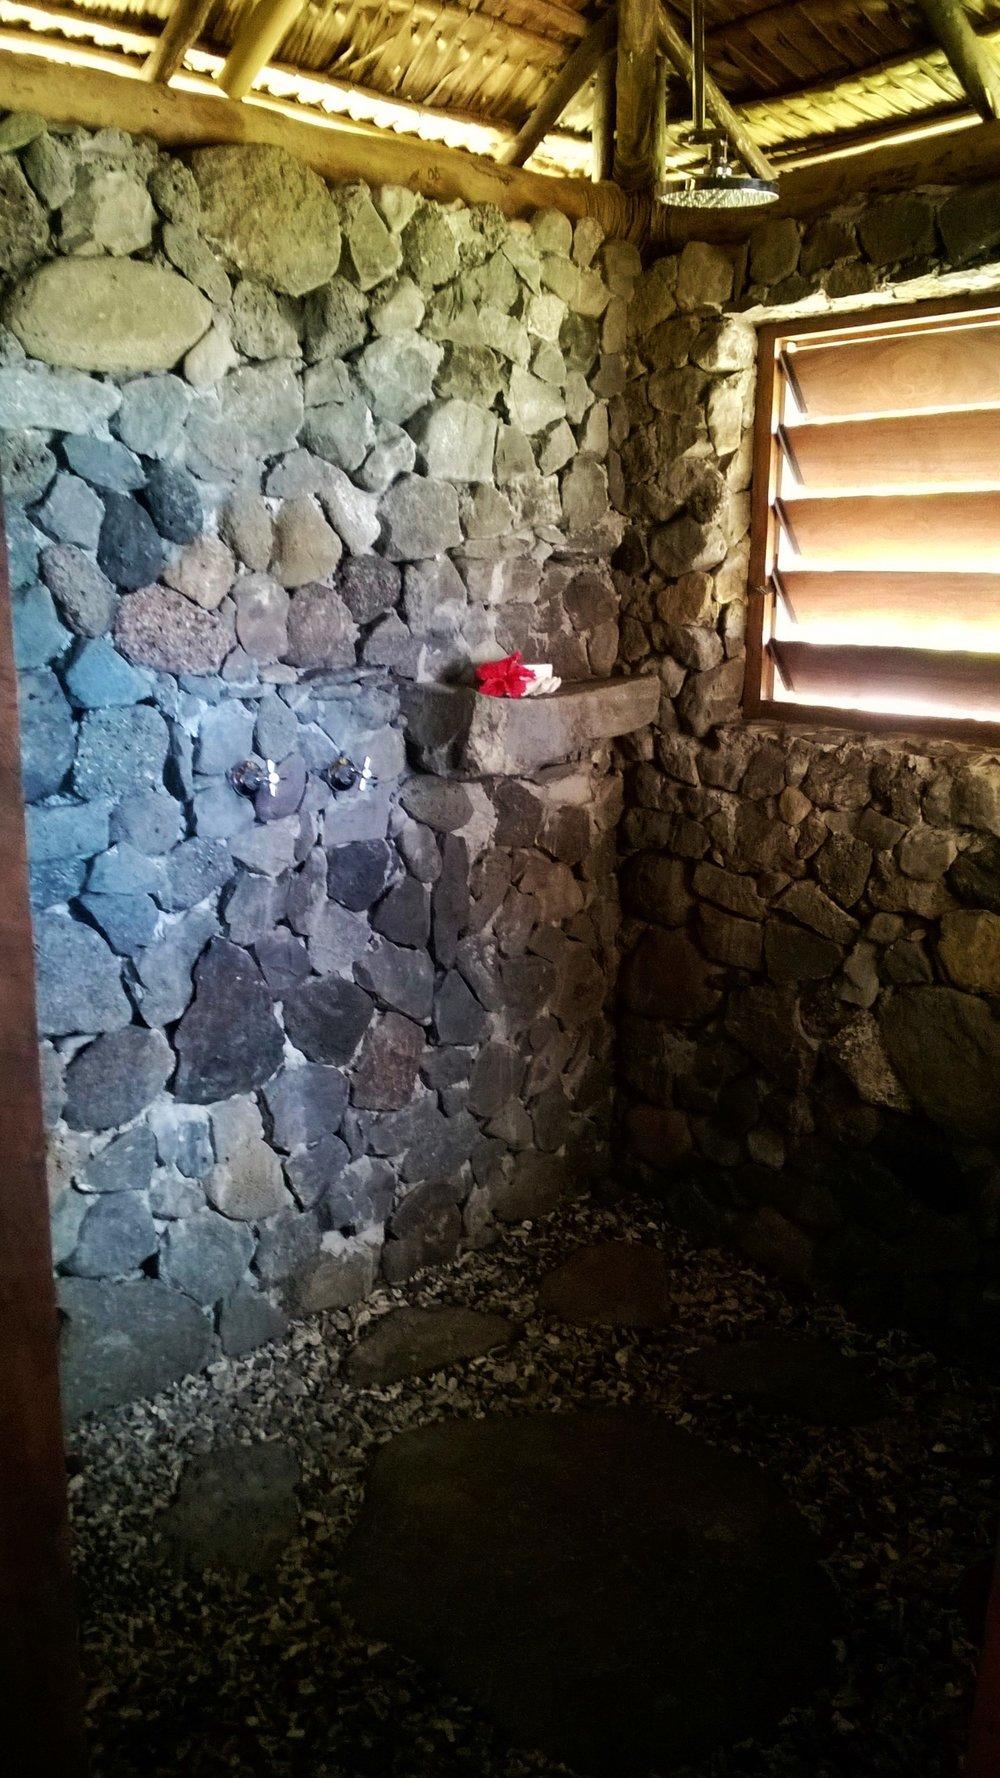 stone+rain+shower.jpg